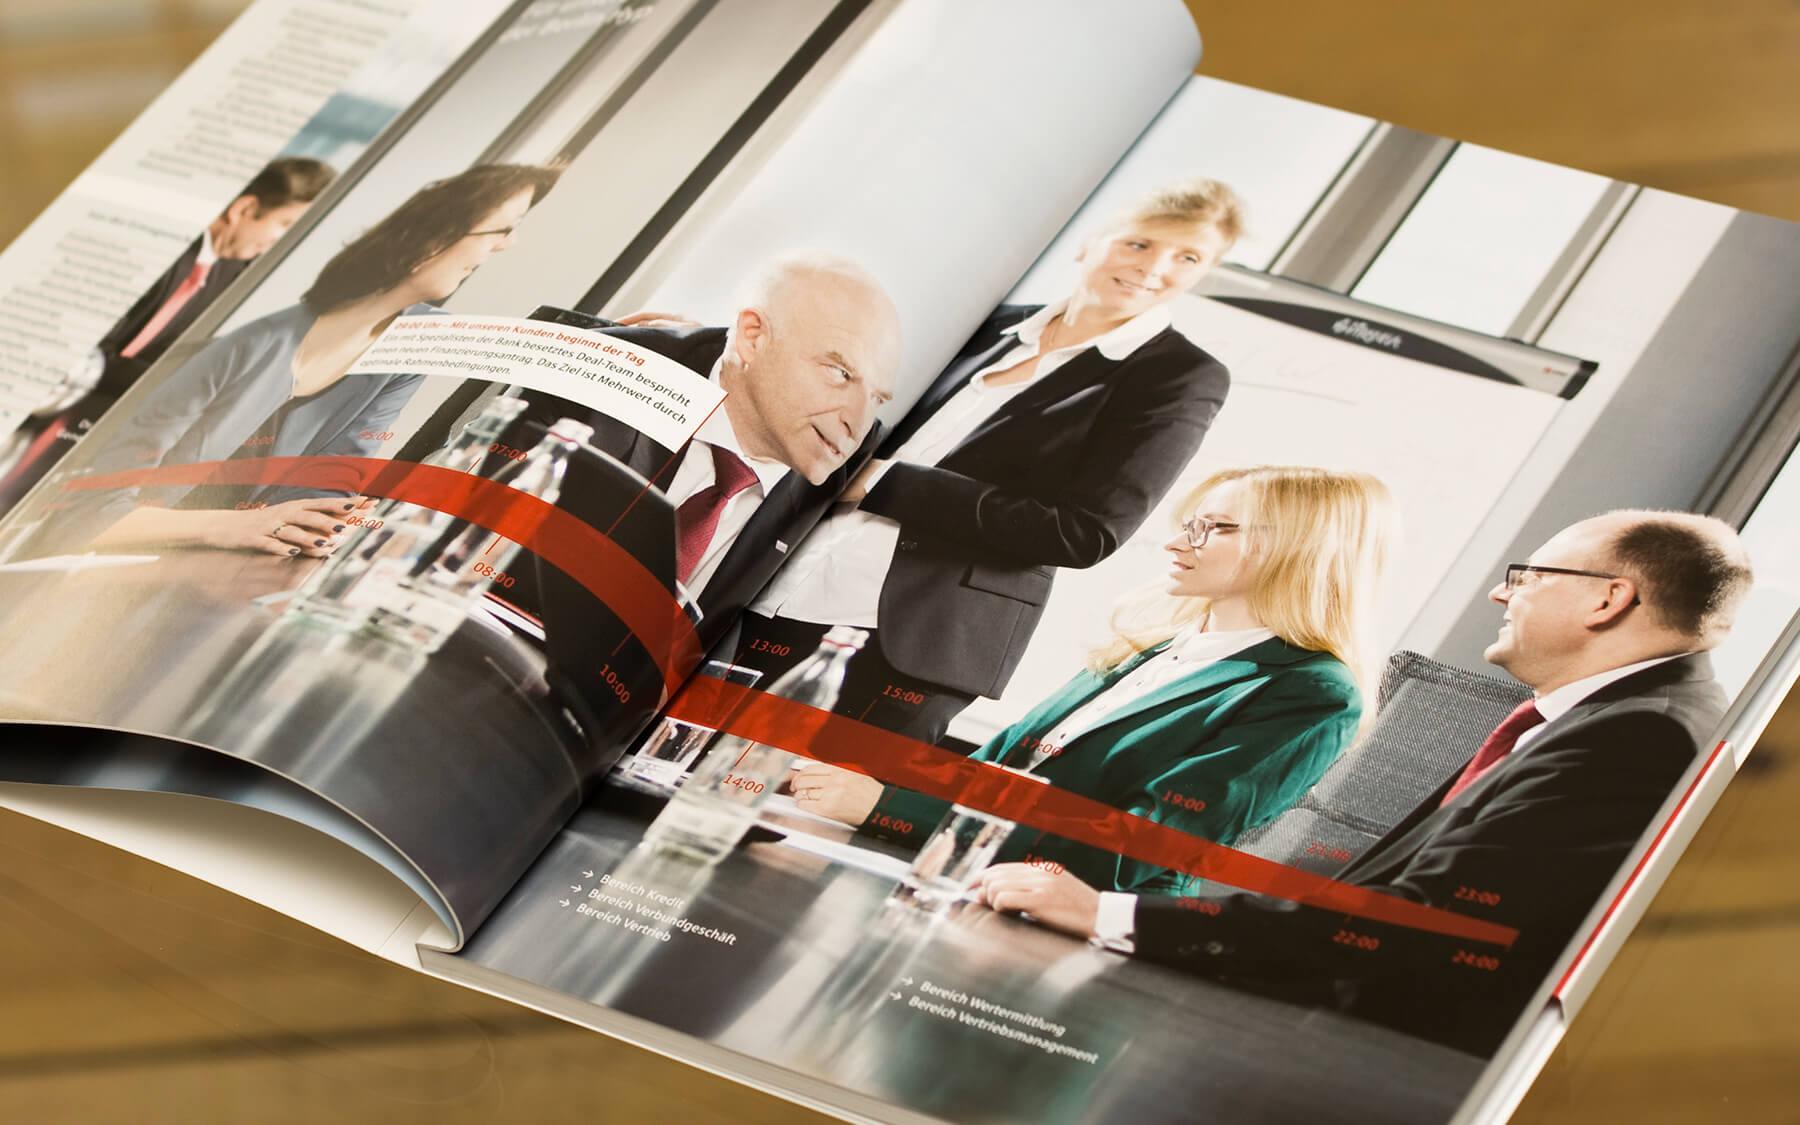 print agentur kataloge werbematerial stationery plakate kampagnen werbeagentur berlin corporate design big picture